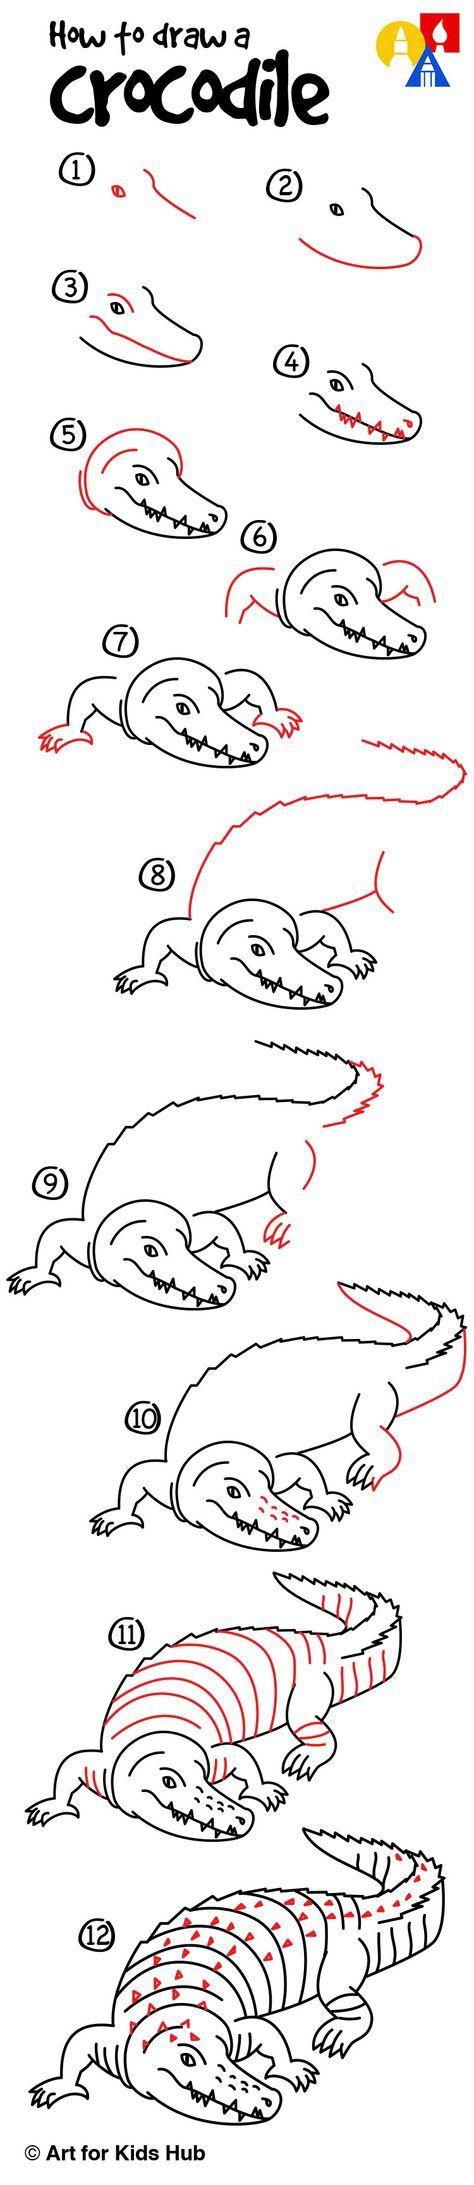 How To Draw A Realistic Crocodile, For Kids! Komodo Dragonsdrawing